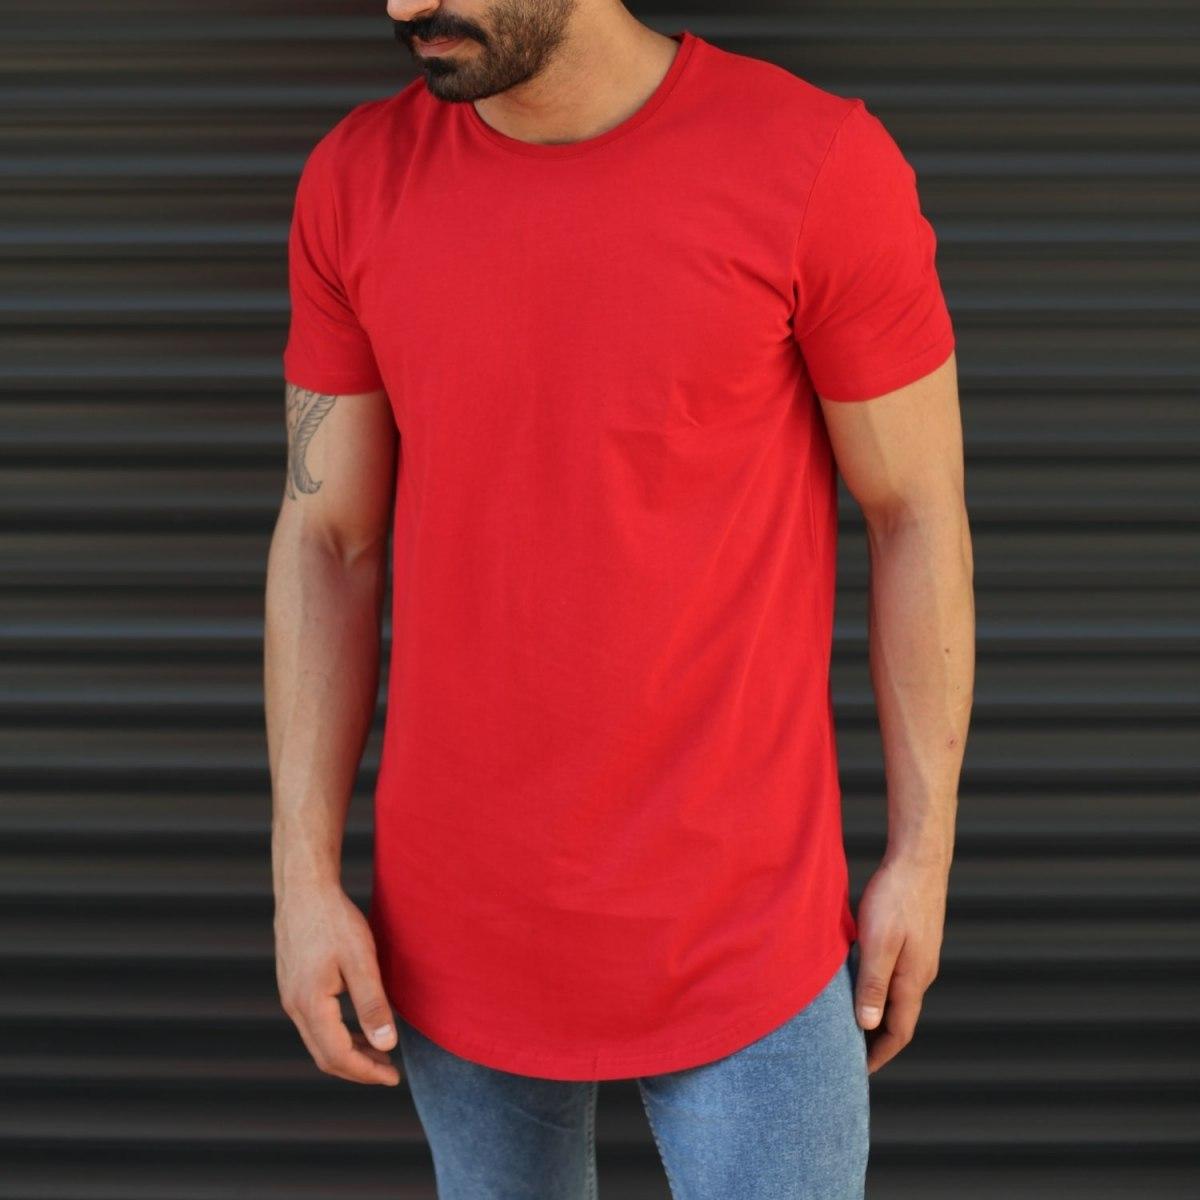 Men's Longline Back-Zipper T-Shirt In Red Mv Premium Brand - 1